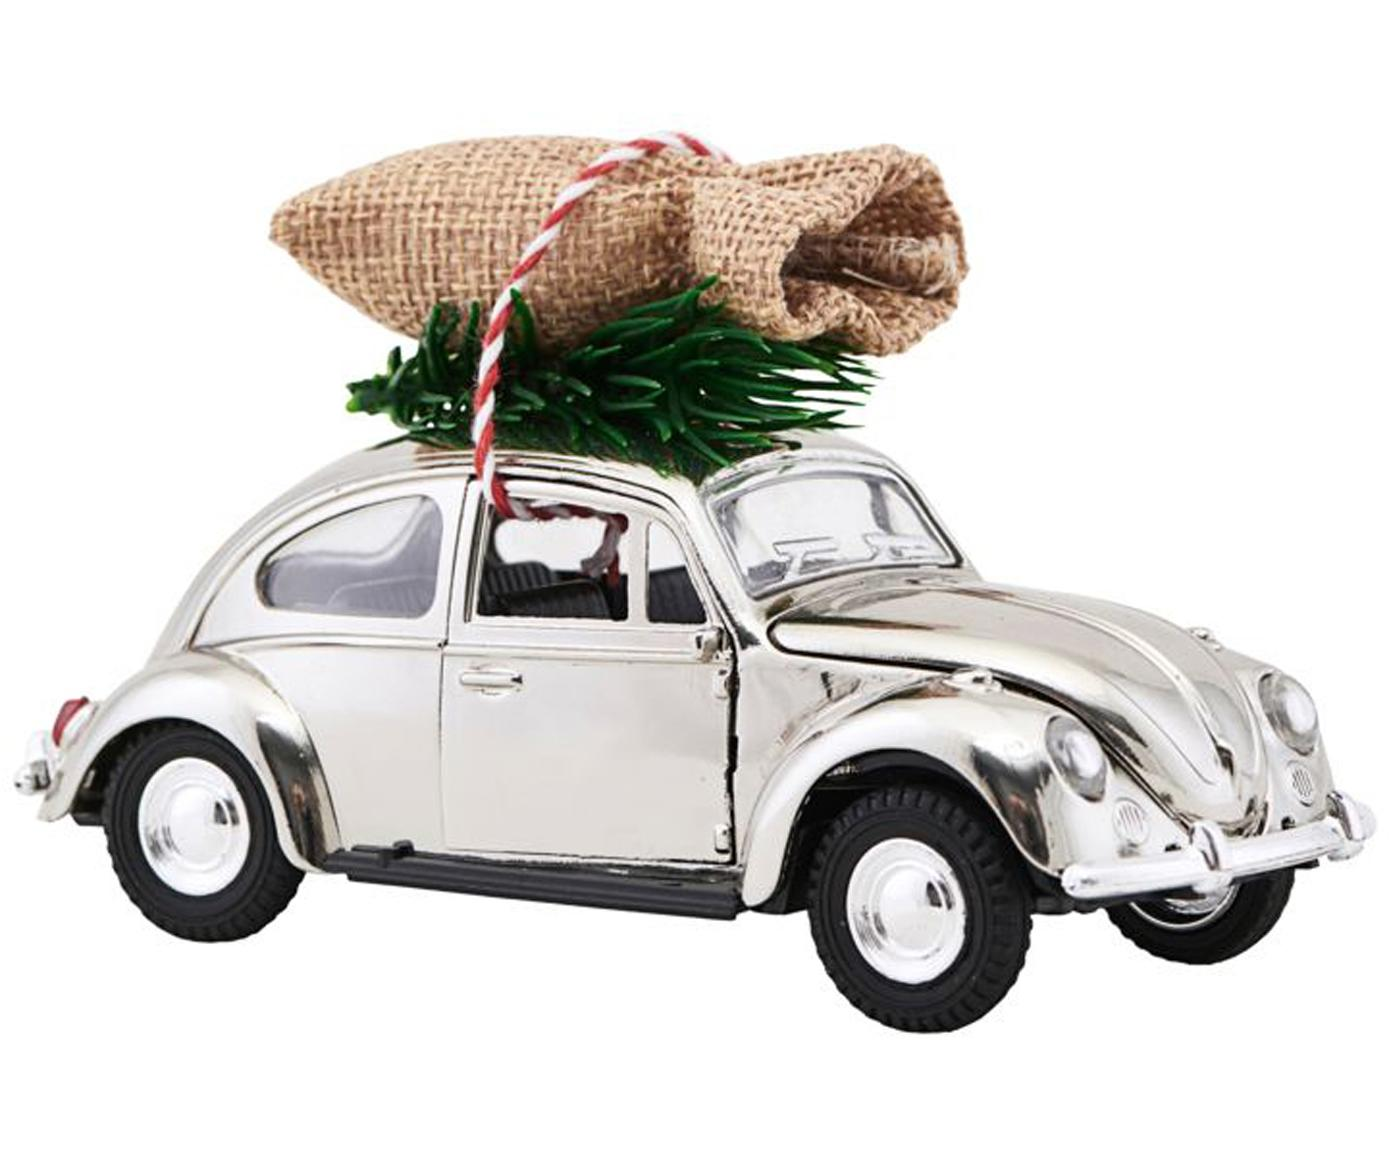 Macchina natalizia decorativa XMAS Delivery, Zinco, plastica, Cromo, verde, beige, Larg. 5 x Alt. 7 cm